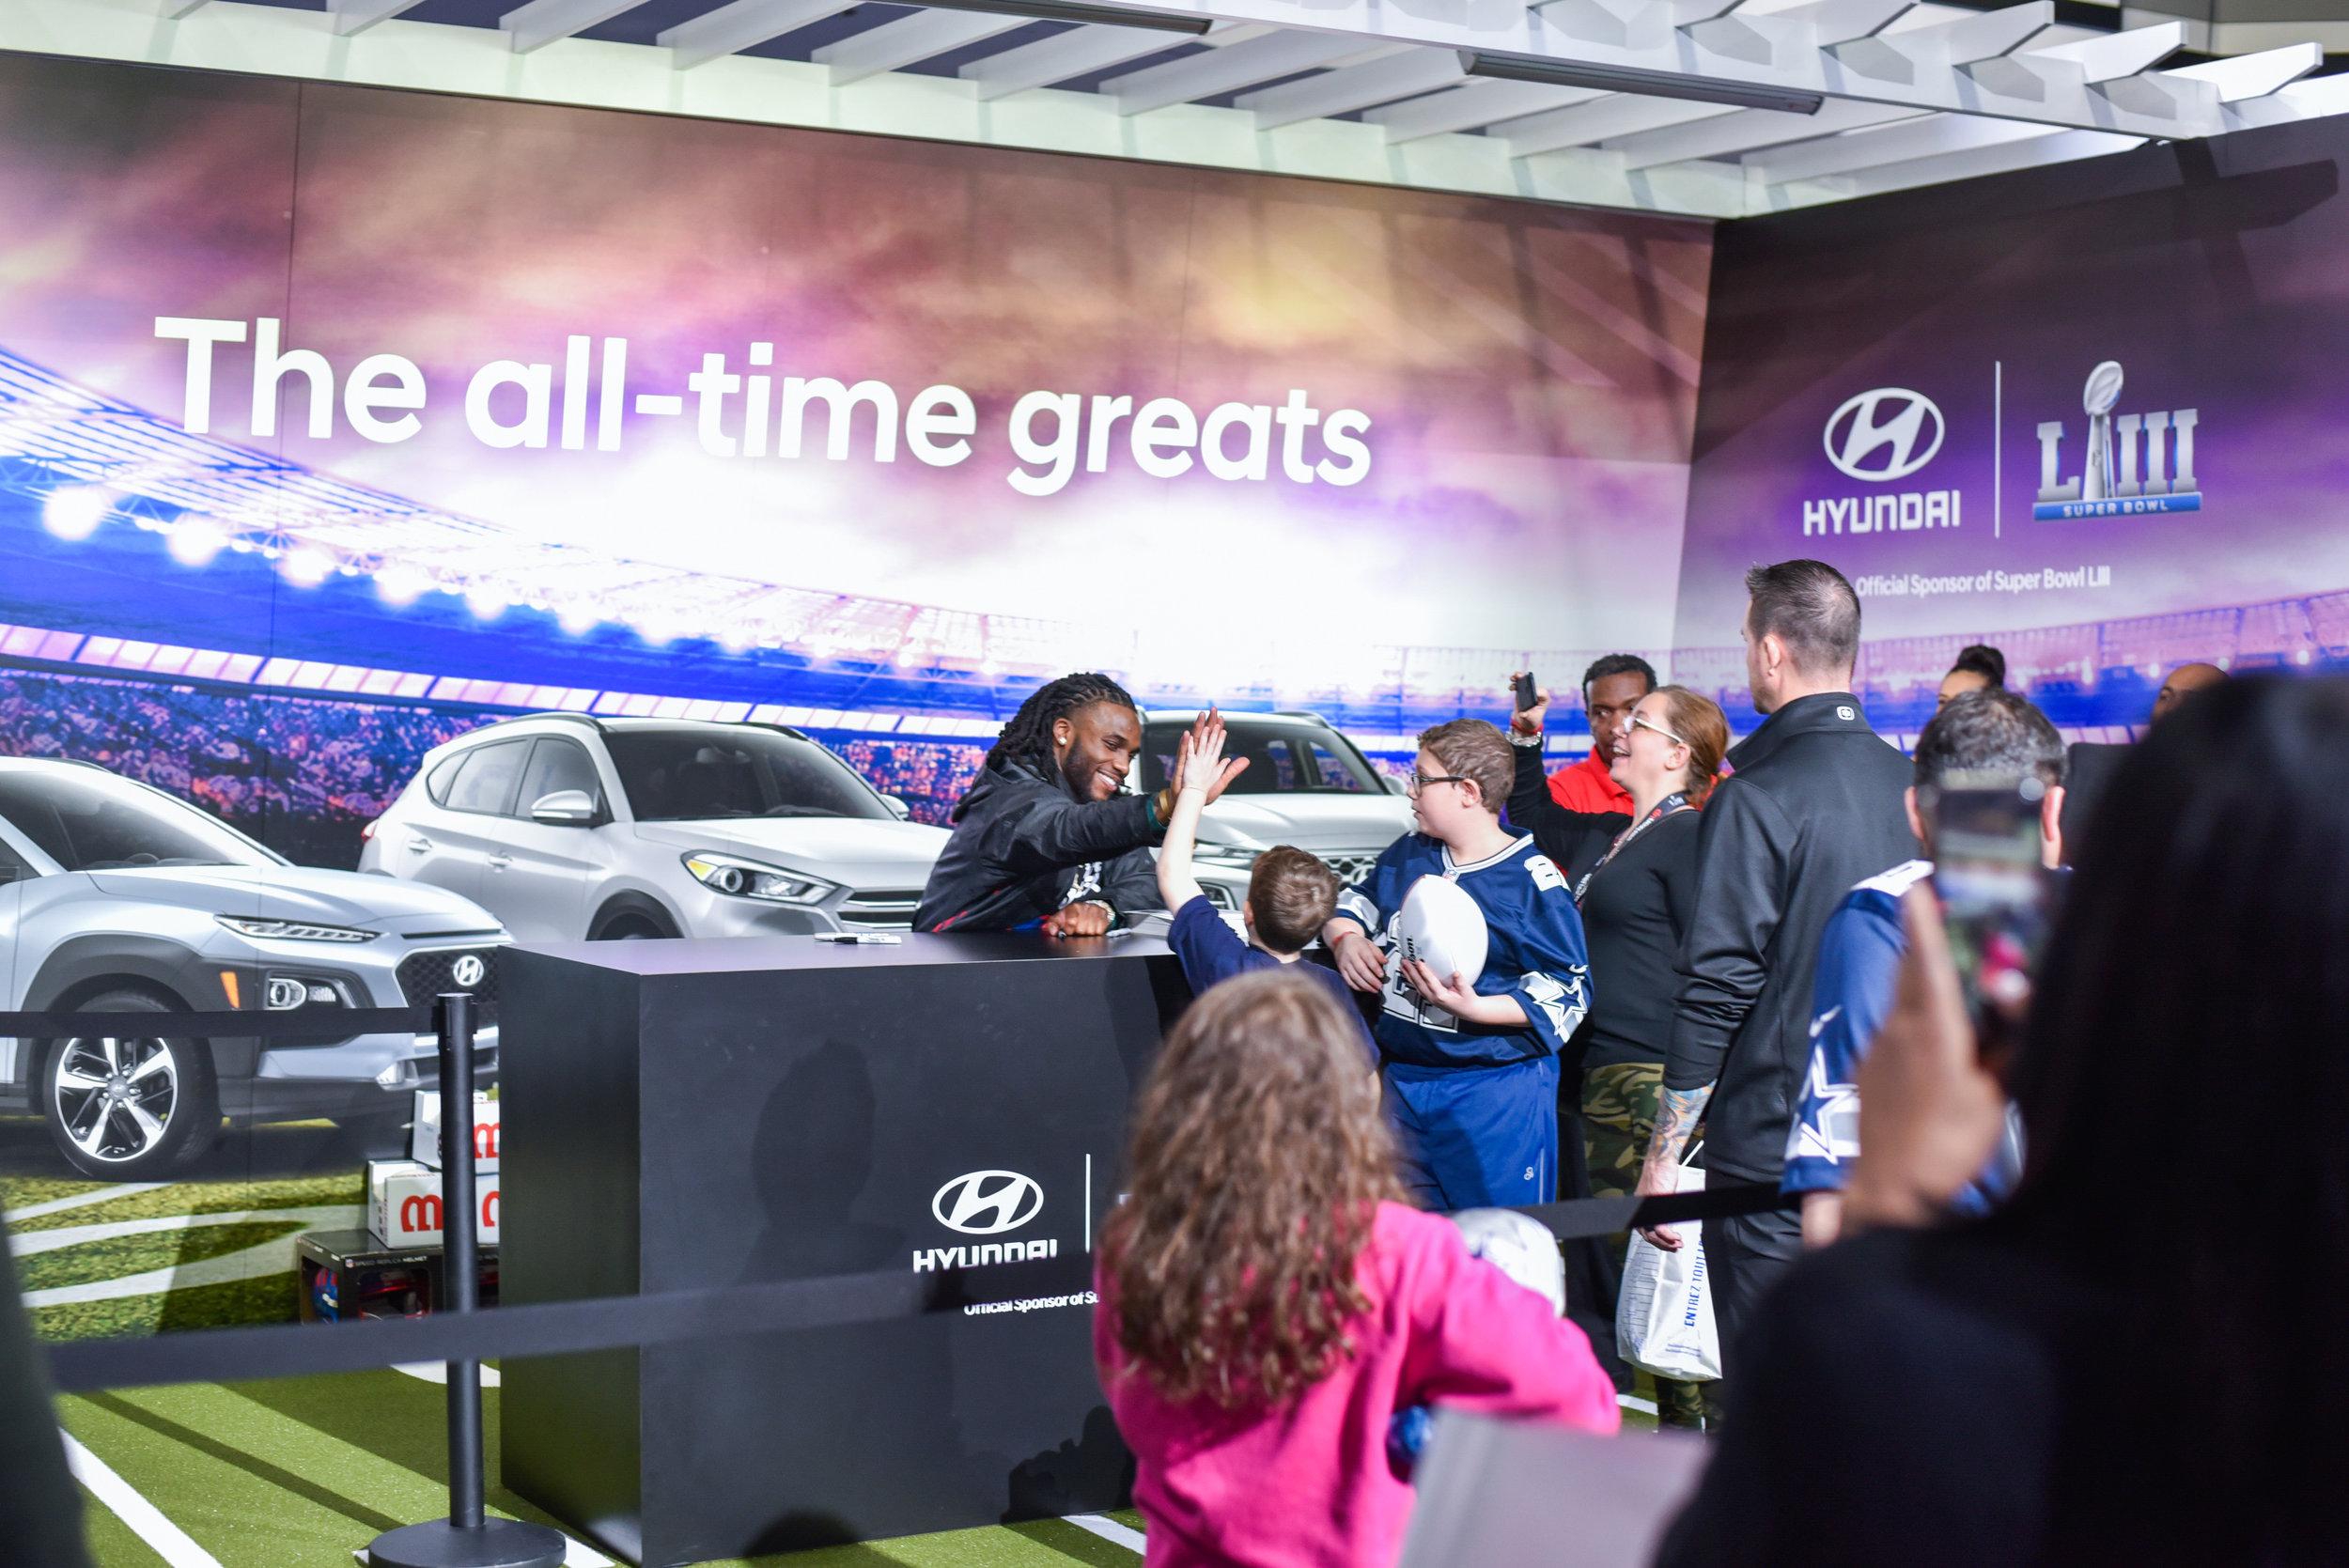 OHelloMedia - Advantage International- Hyundai @ SB Experience-Top Selects-3-2.jpg